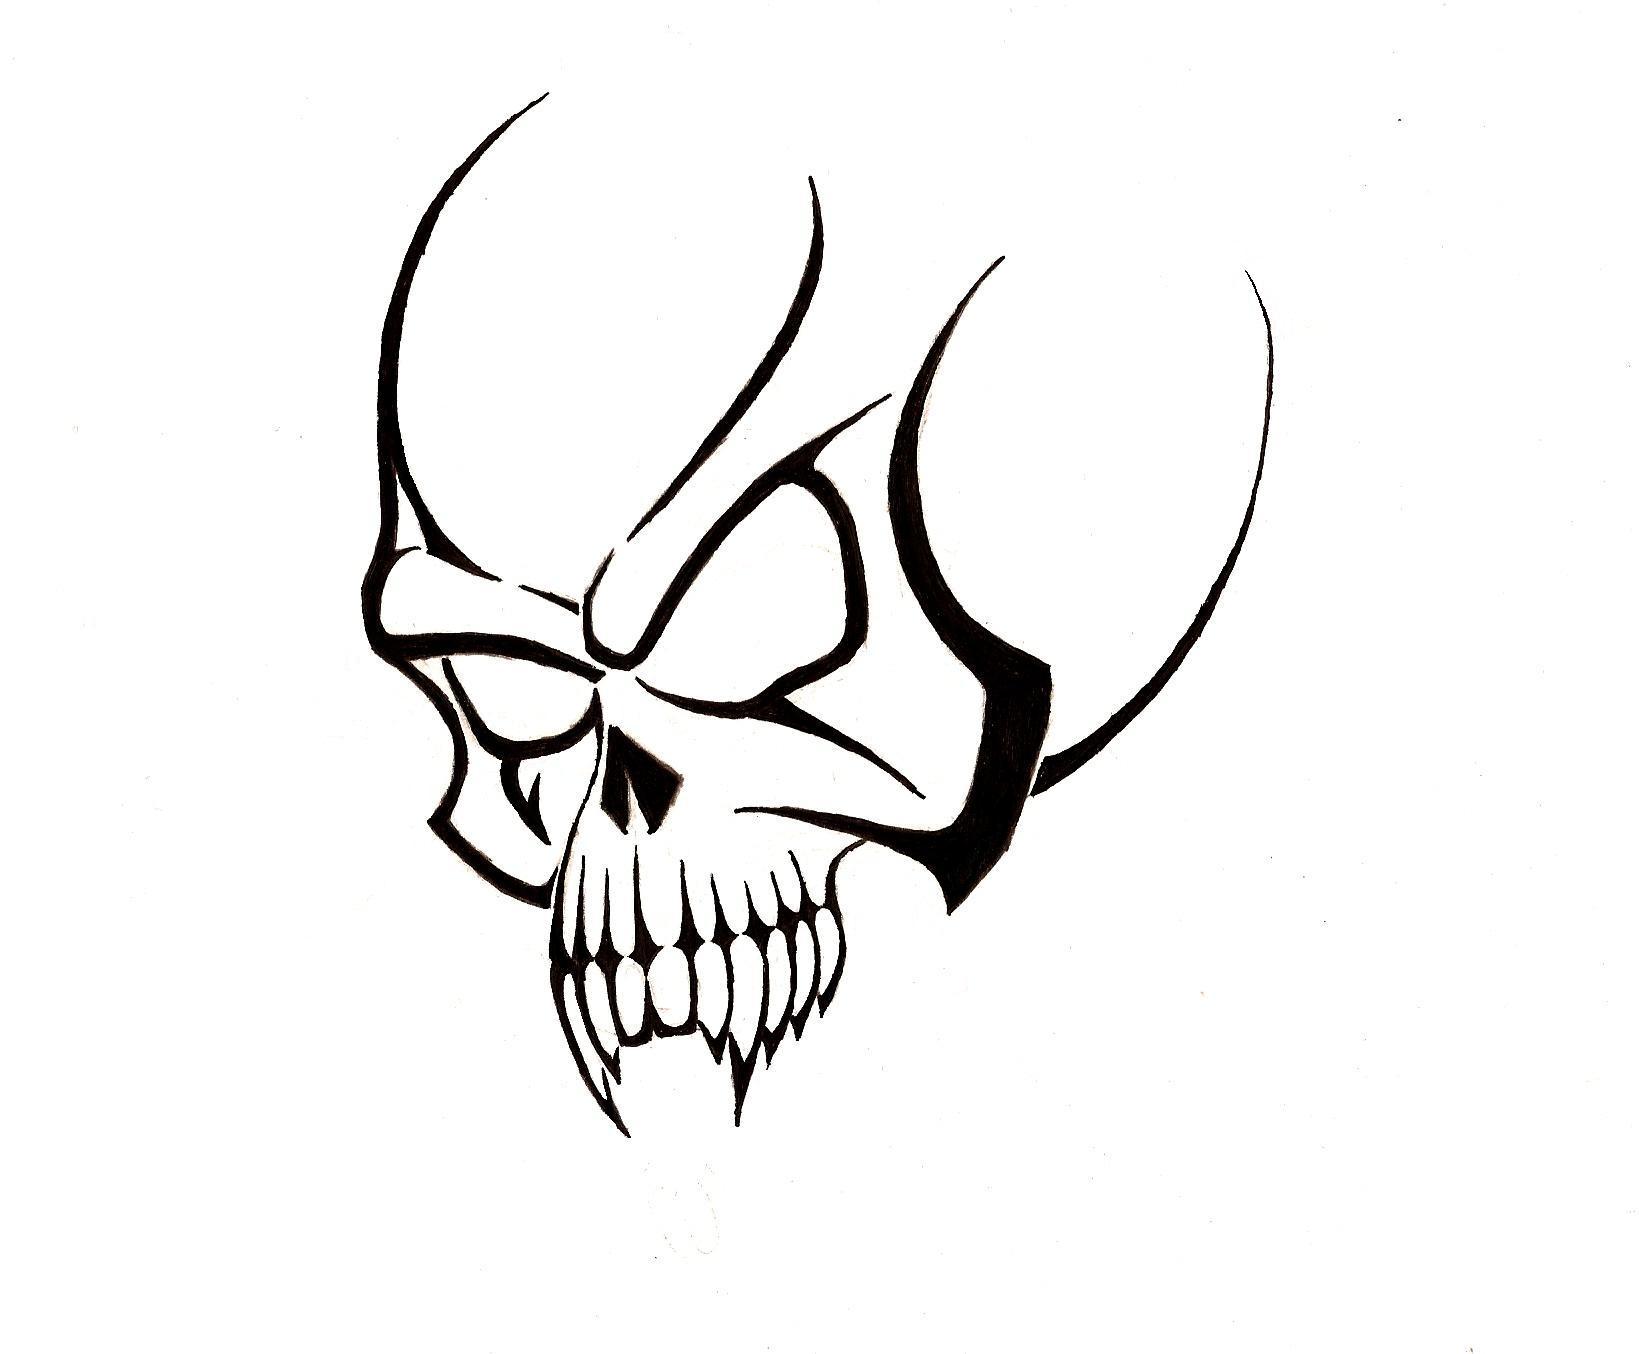 free skull tattoo designs to print clipart best. Black Bedroom Furniture Sets. Home Design Ideas